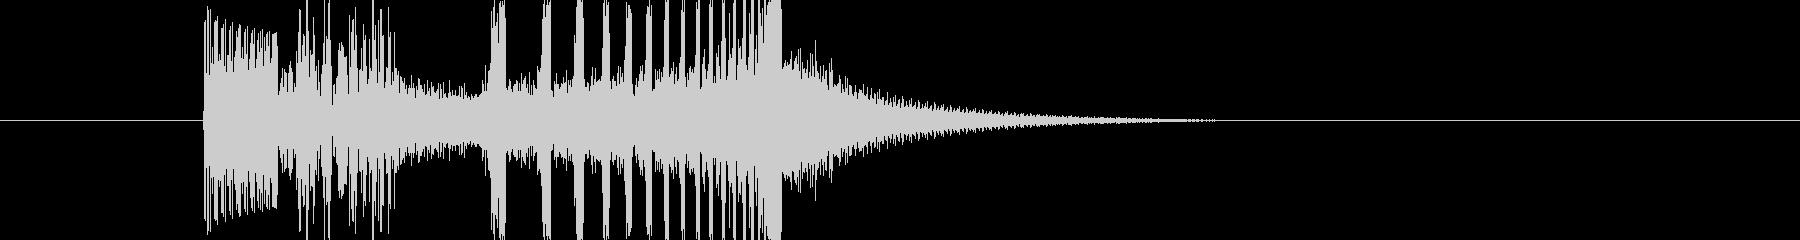 FINESWEEP VERSION 8の未再生の波形